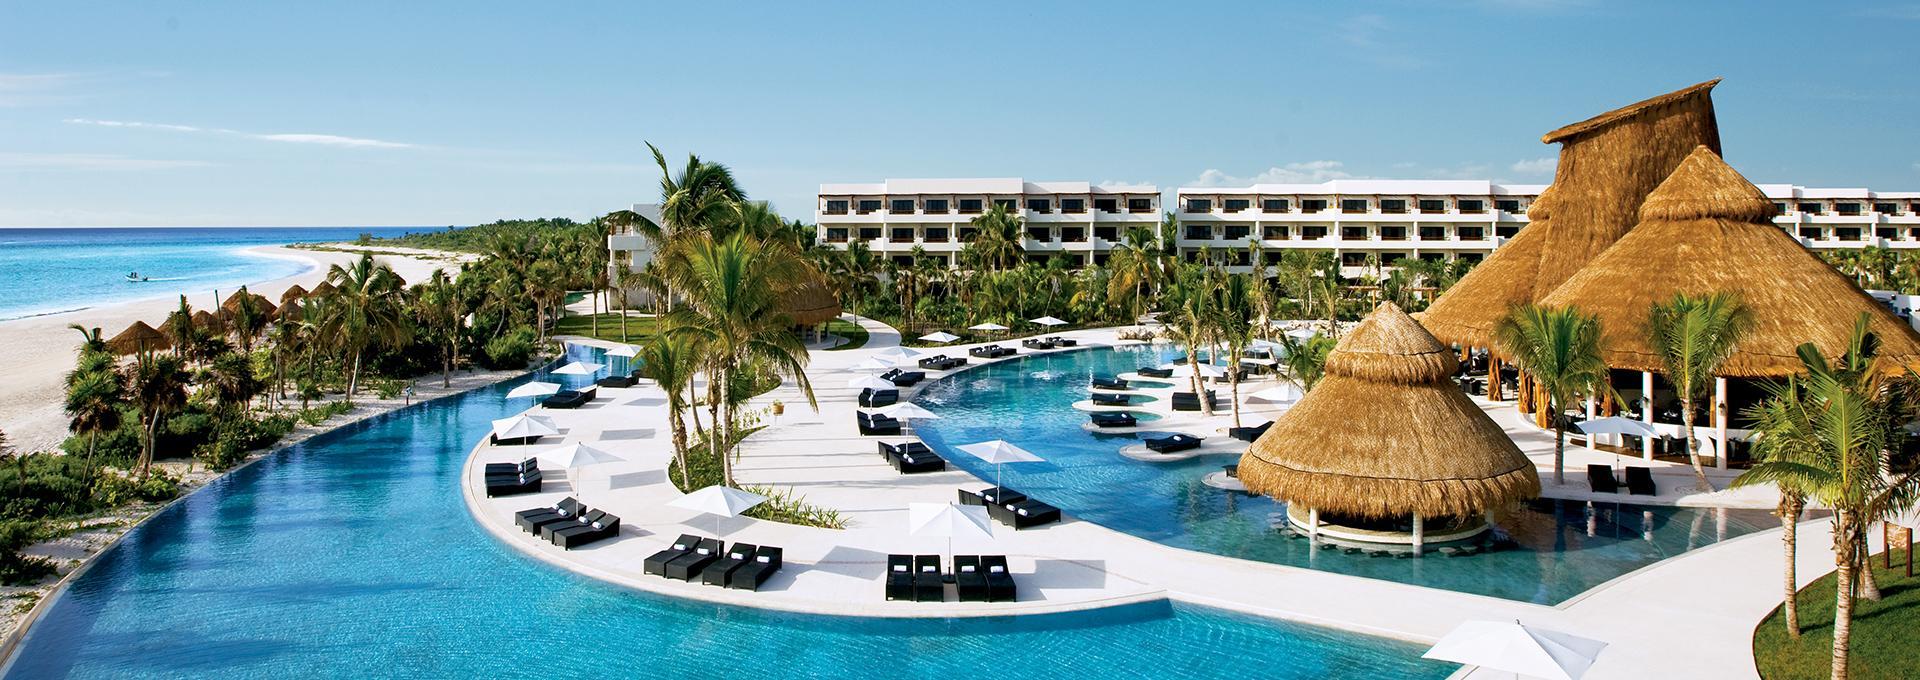 Secrets Maroma Beach Riviera Cancun resort view